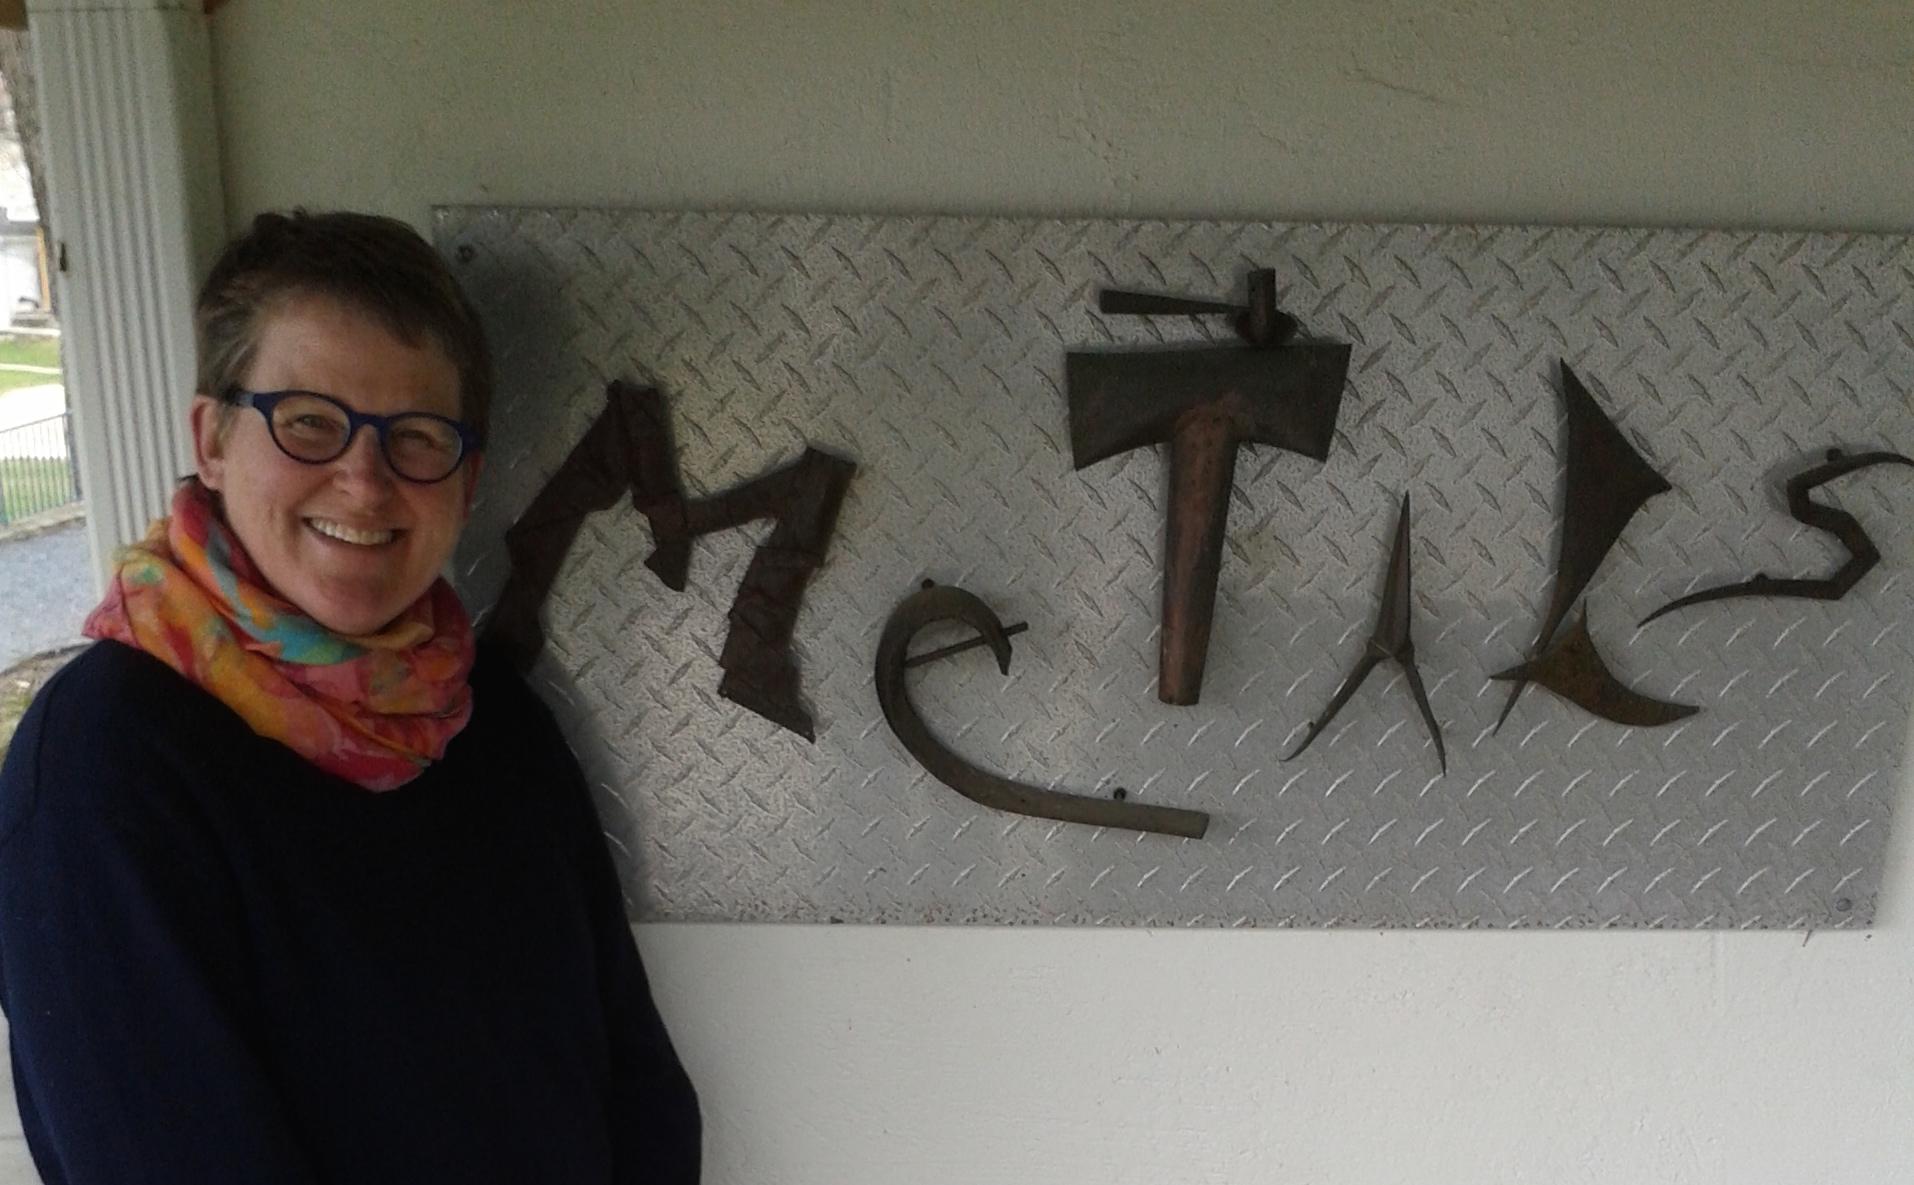 Happy to be at Penland School of Craft in the Metals studio!